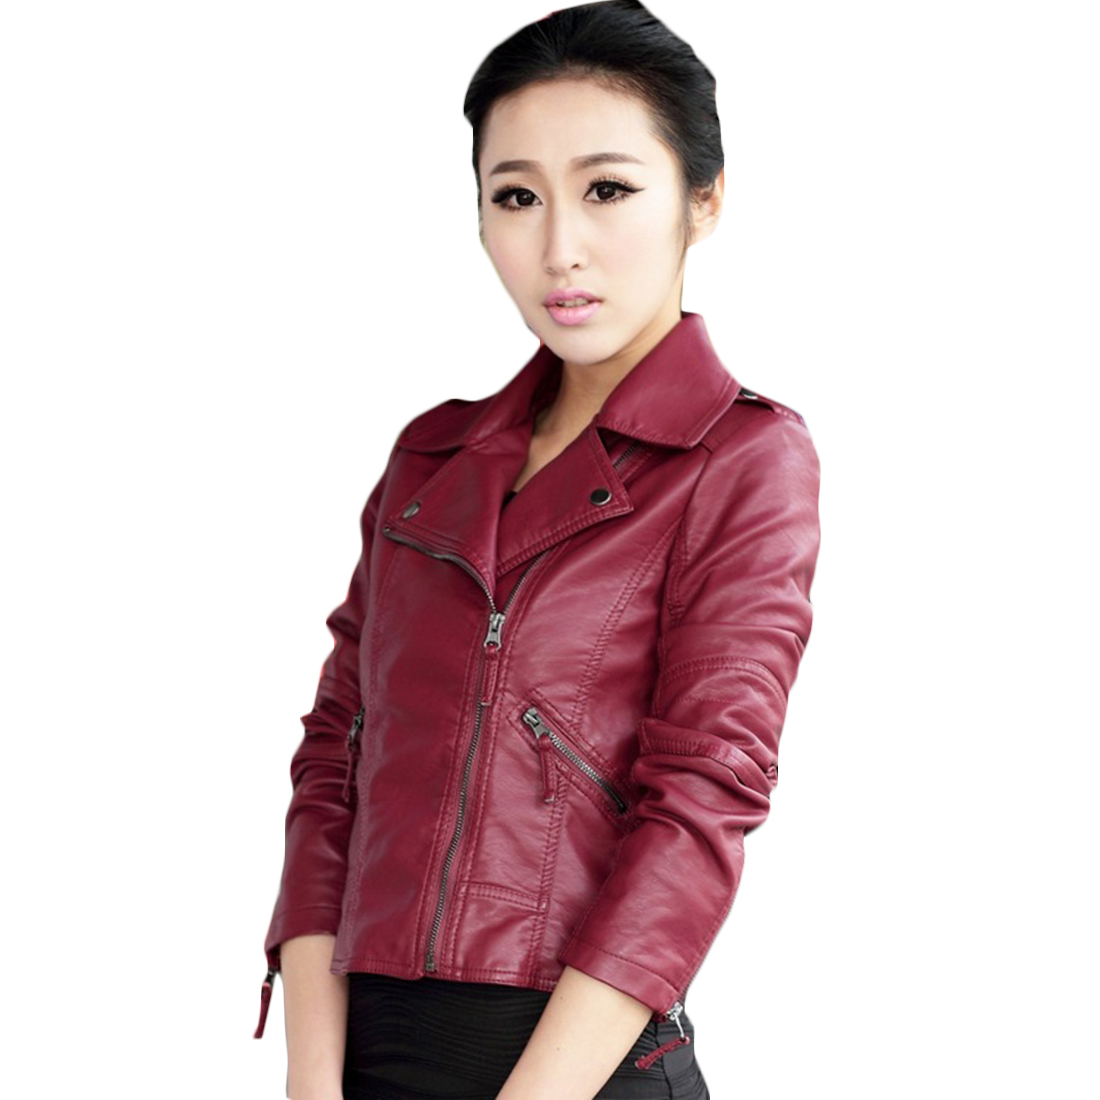 YJSFG HOUSE 2017 Fashion Faux PU Leather font b Jacket b font font b Women b